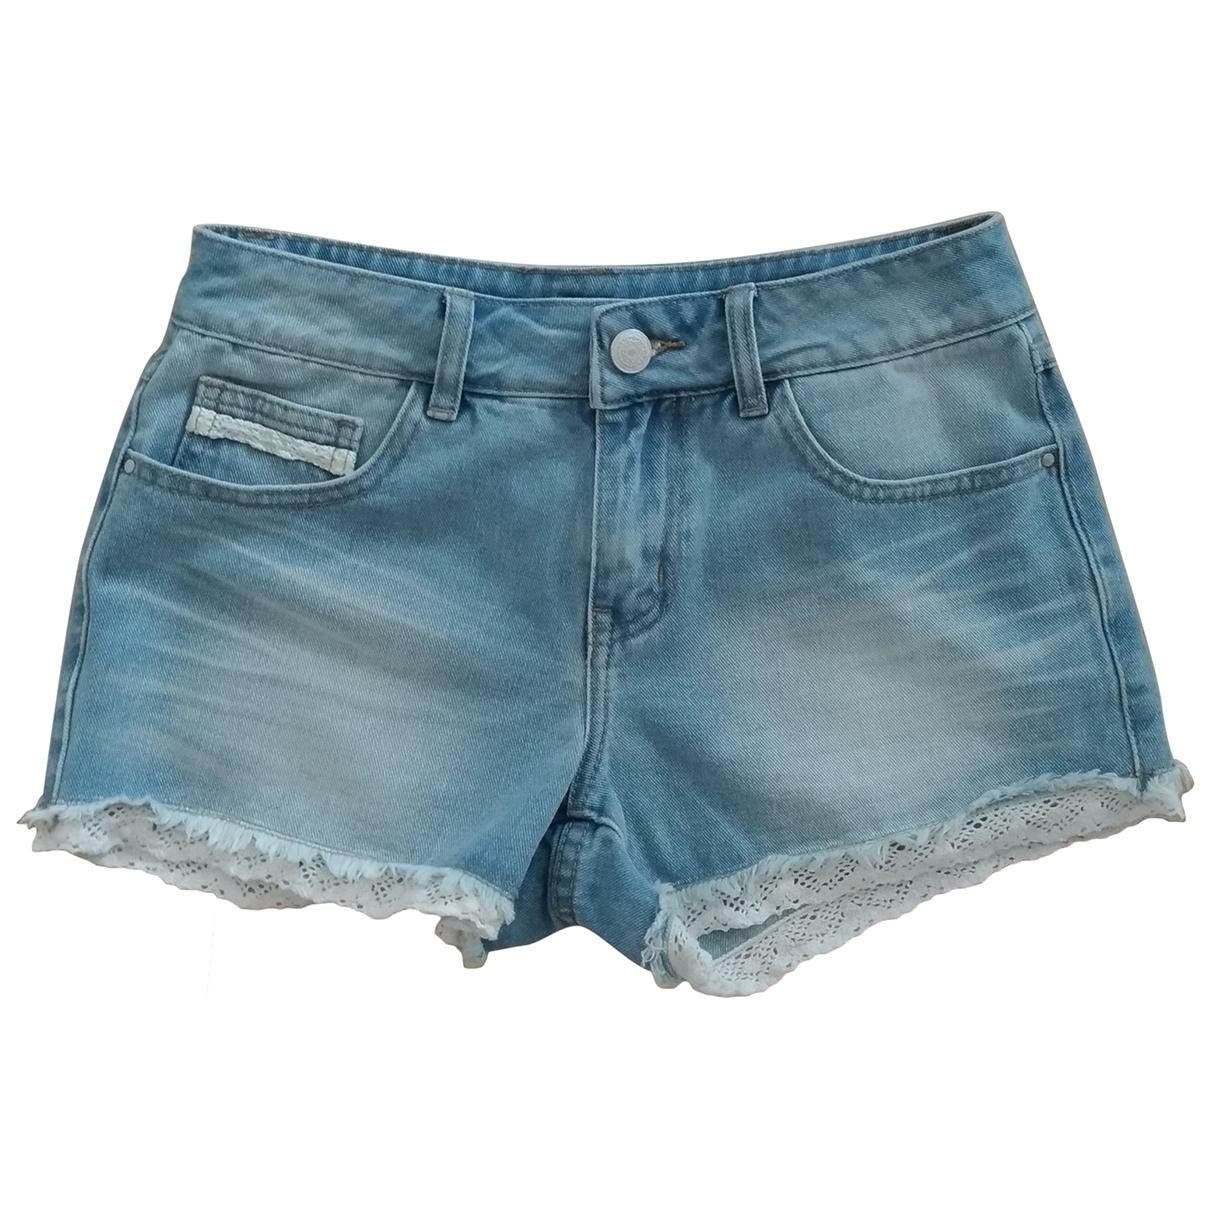 Villa Gaia \N Shorts in  Blau Denim - Jeans